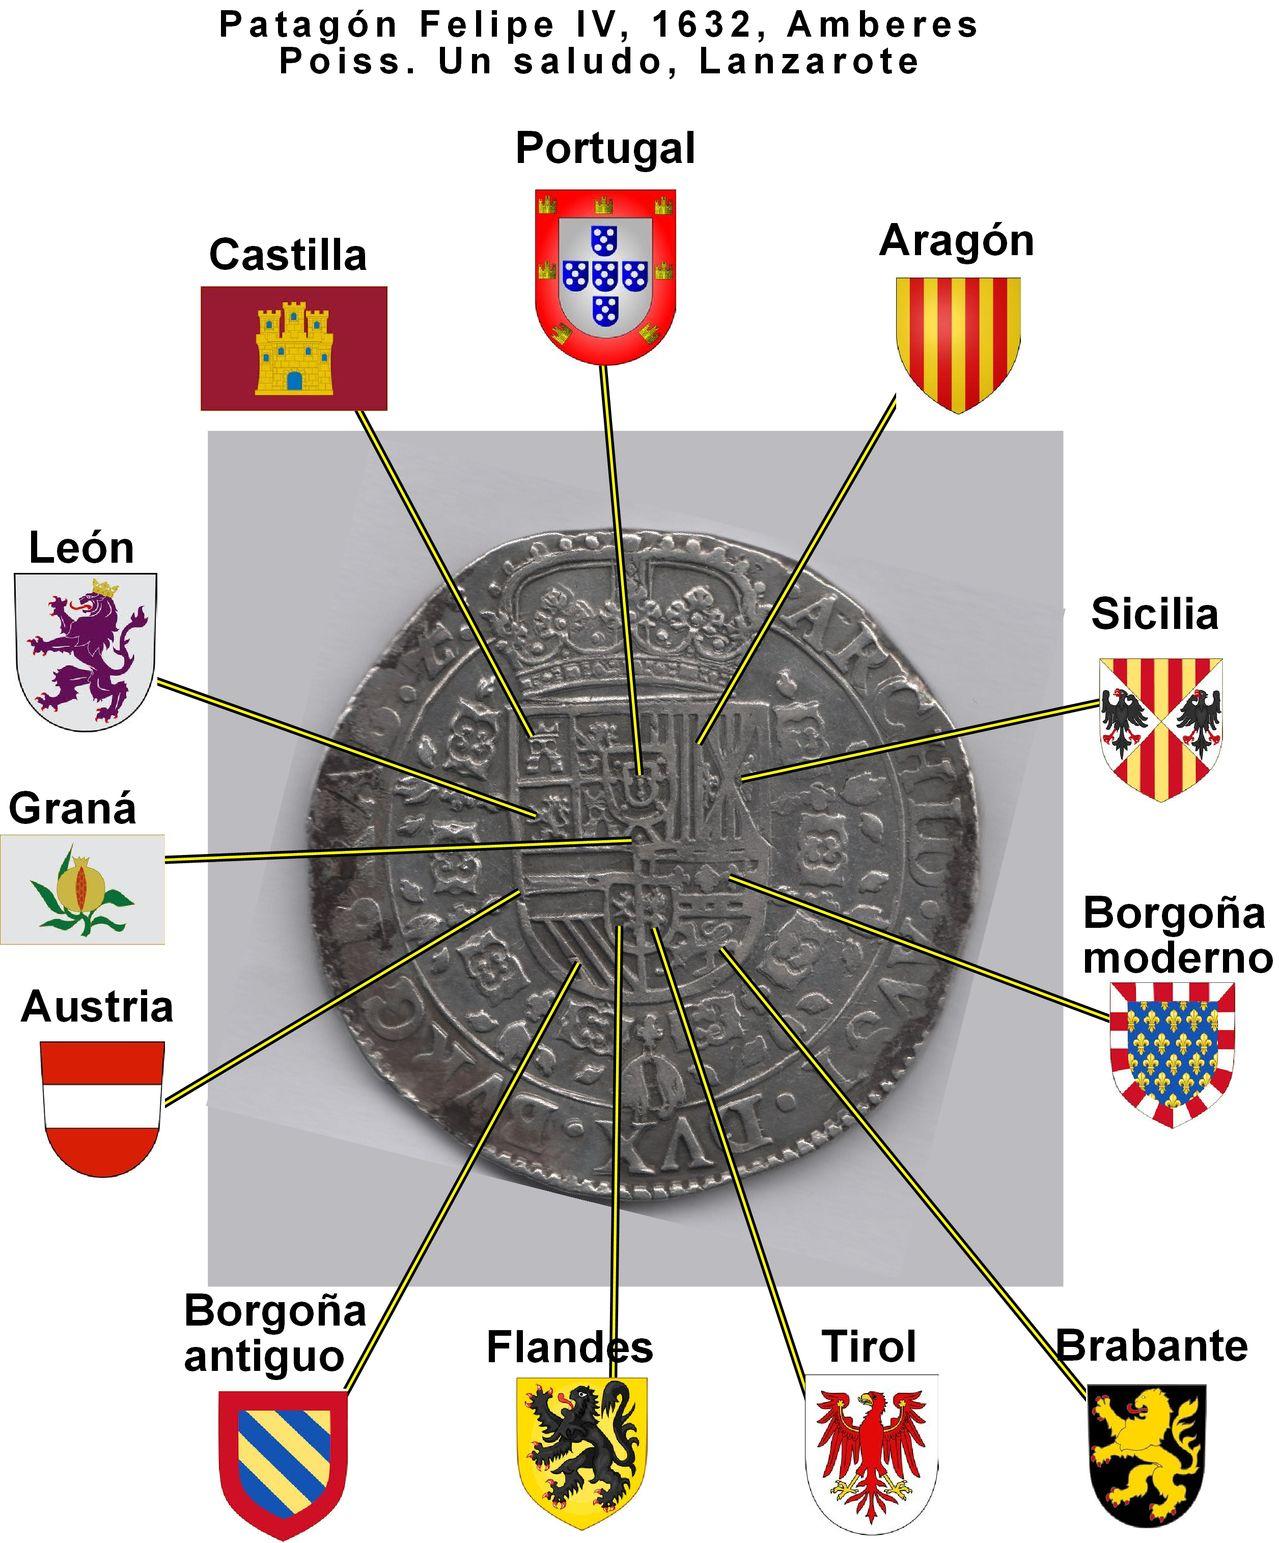 Patagón 1632 Felipe IV, Amberes. Patag_n_poiss_desglosado